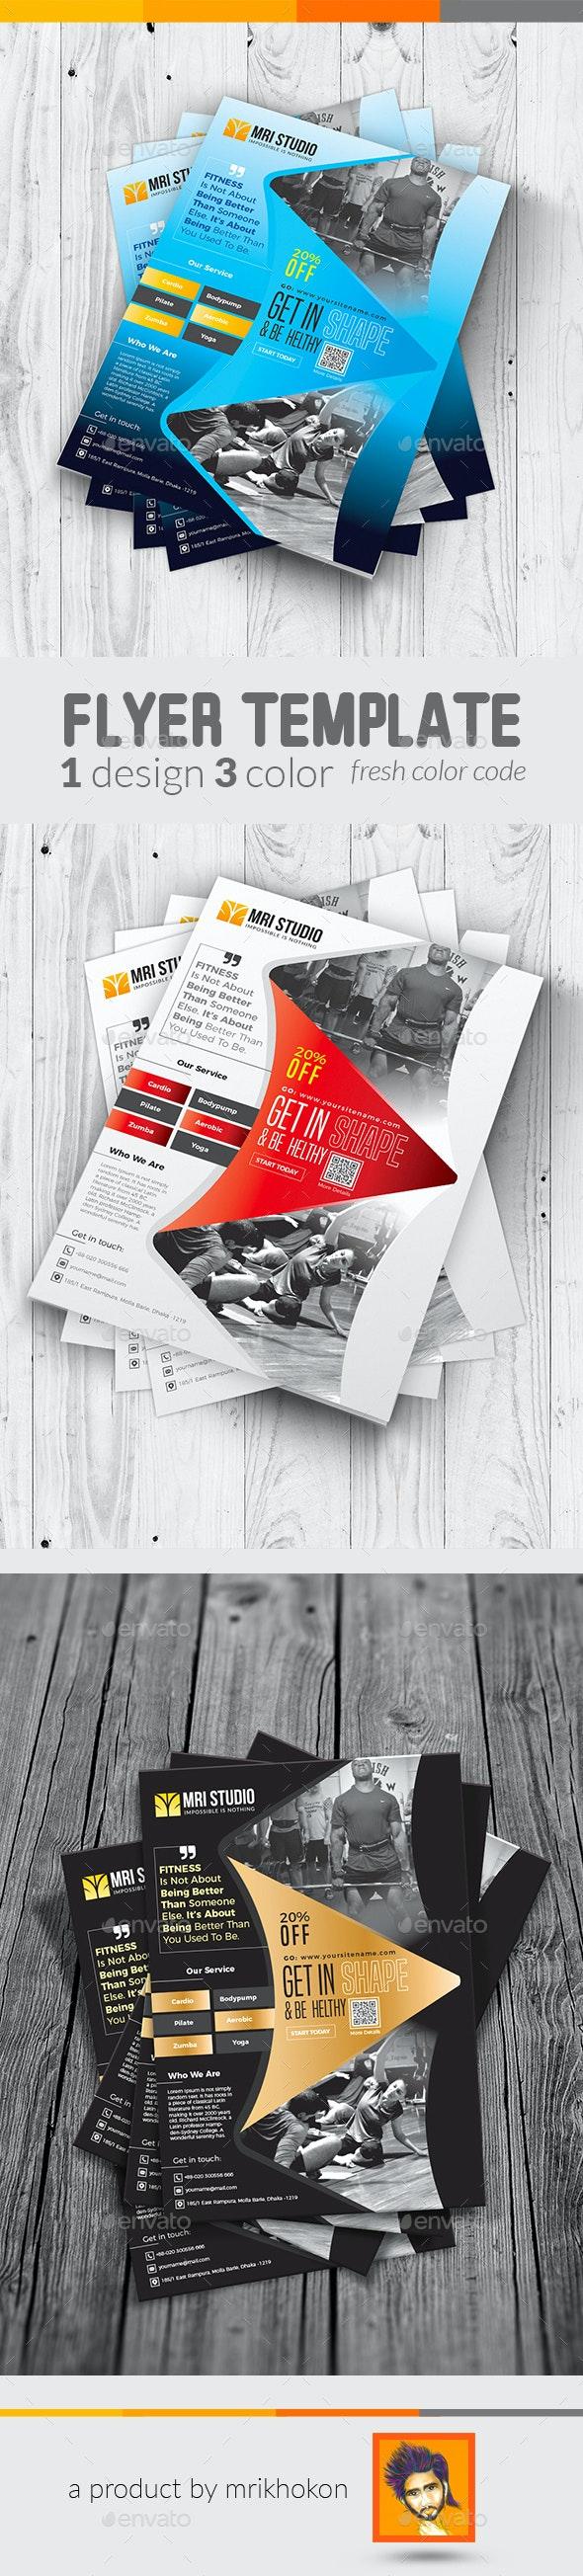 Fitness Flyer / Gym Flyer Template - Flyers Print Templates